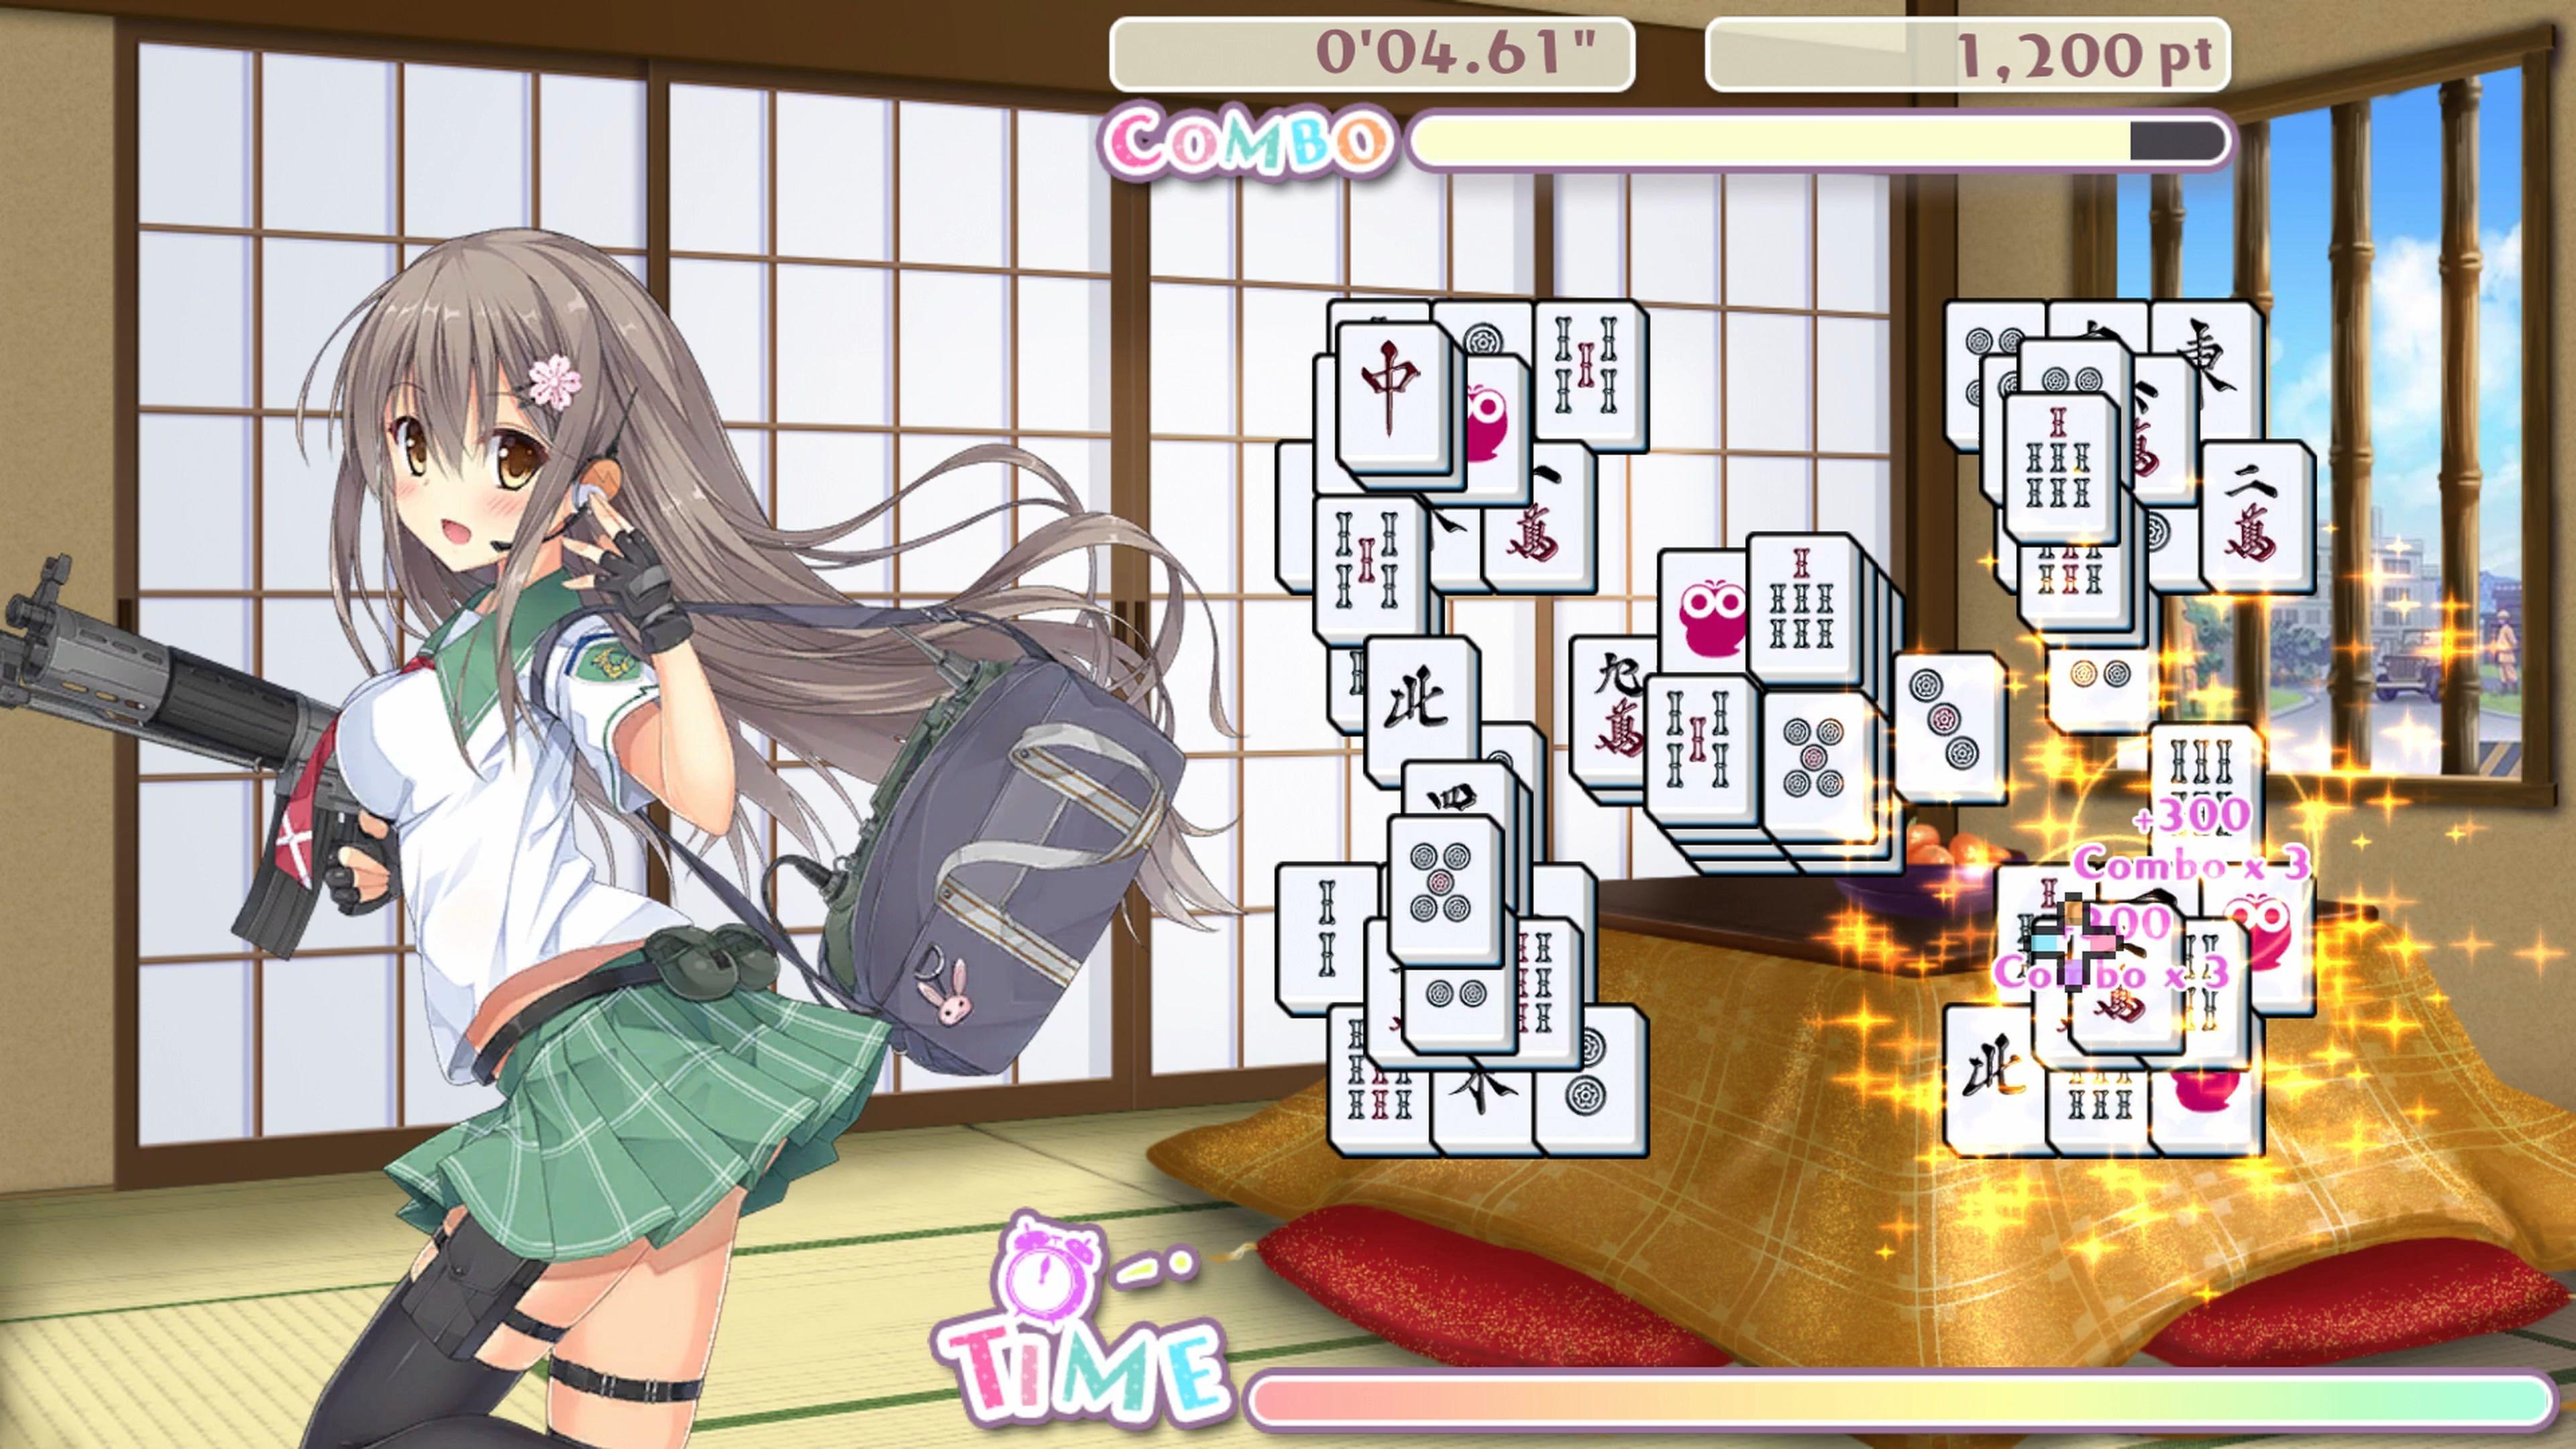 Скриншот №5 к Bishoujo Battle Mahjong Solitaire PS4 and PS5